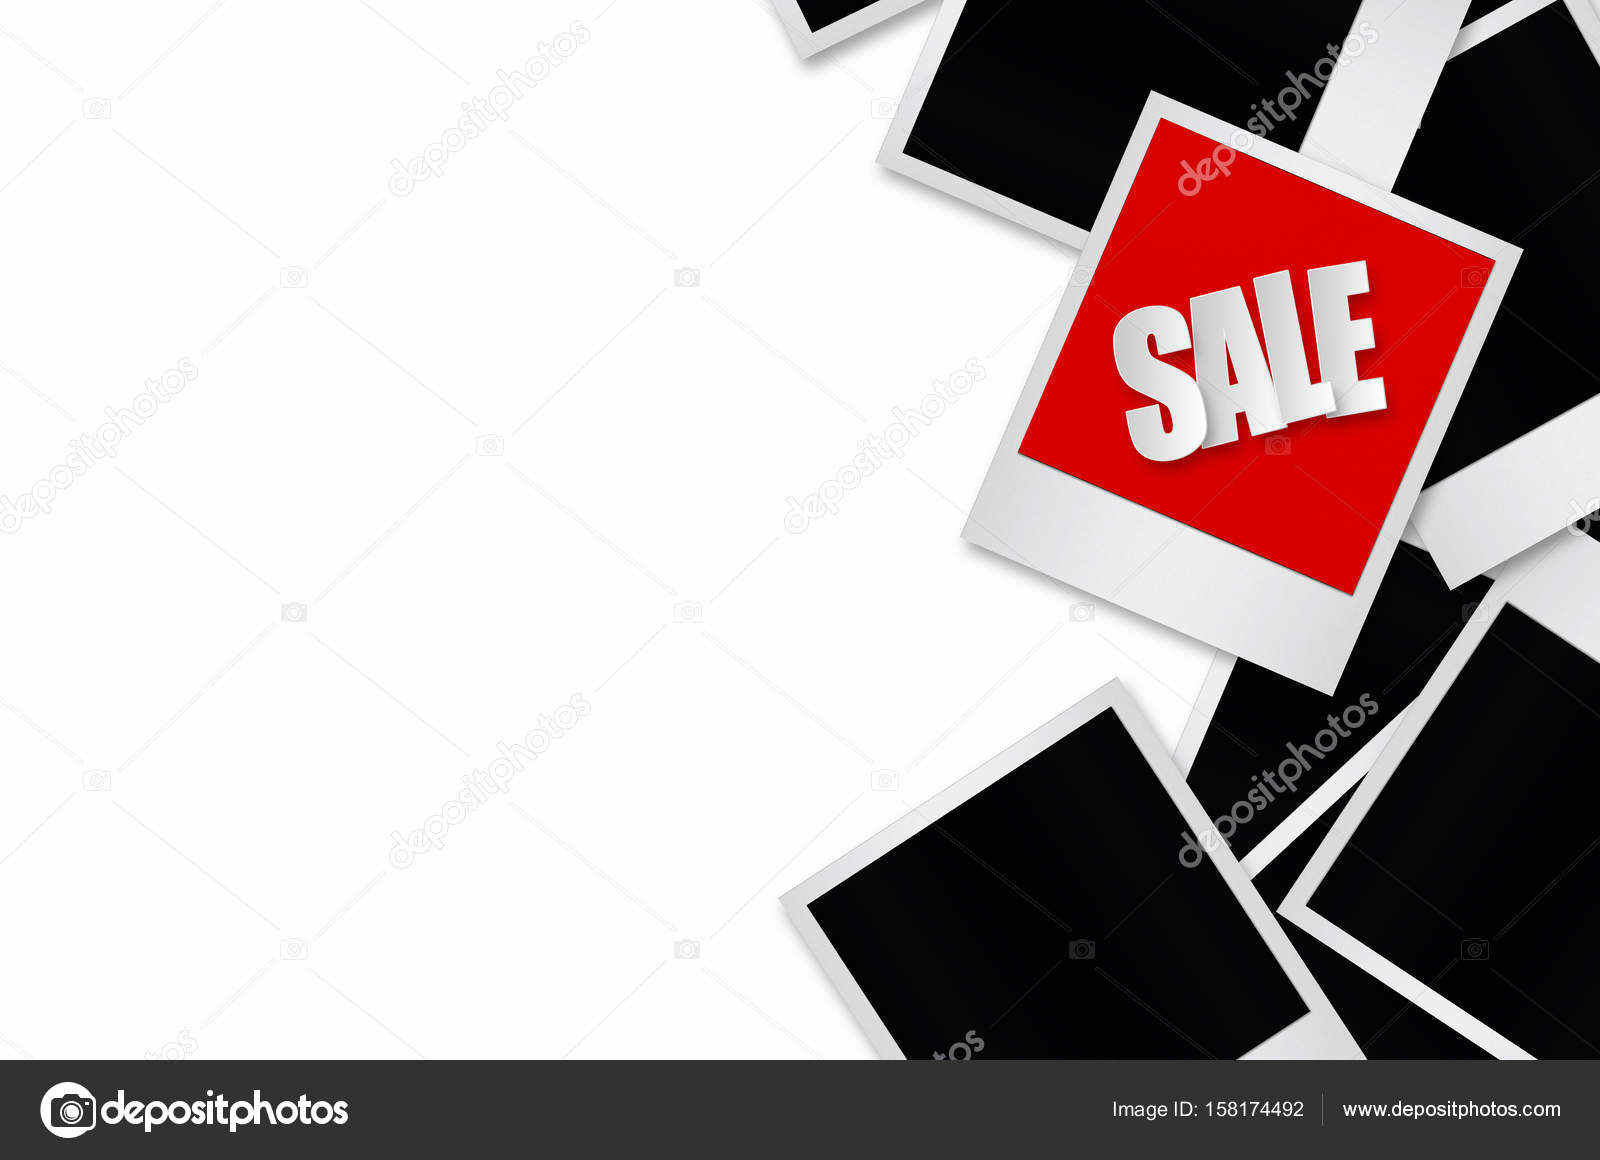 Verkauf-Label in Bilderrahmen — Stockfoto © nirutdps #158174492